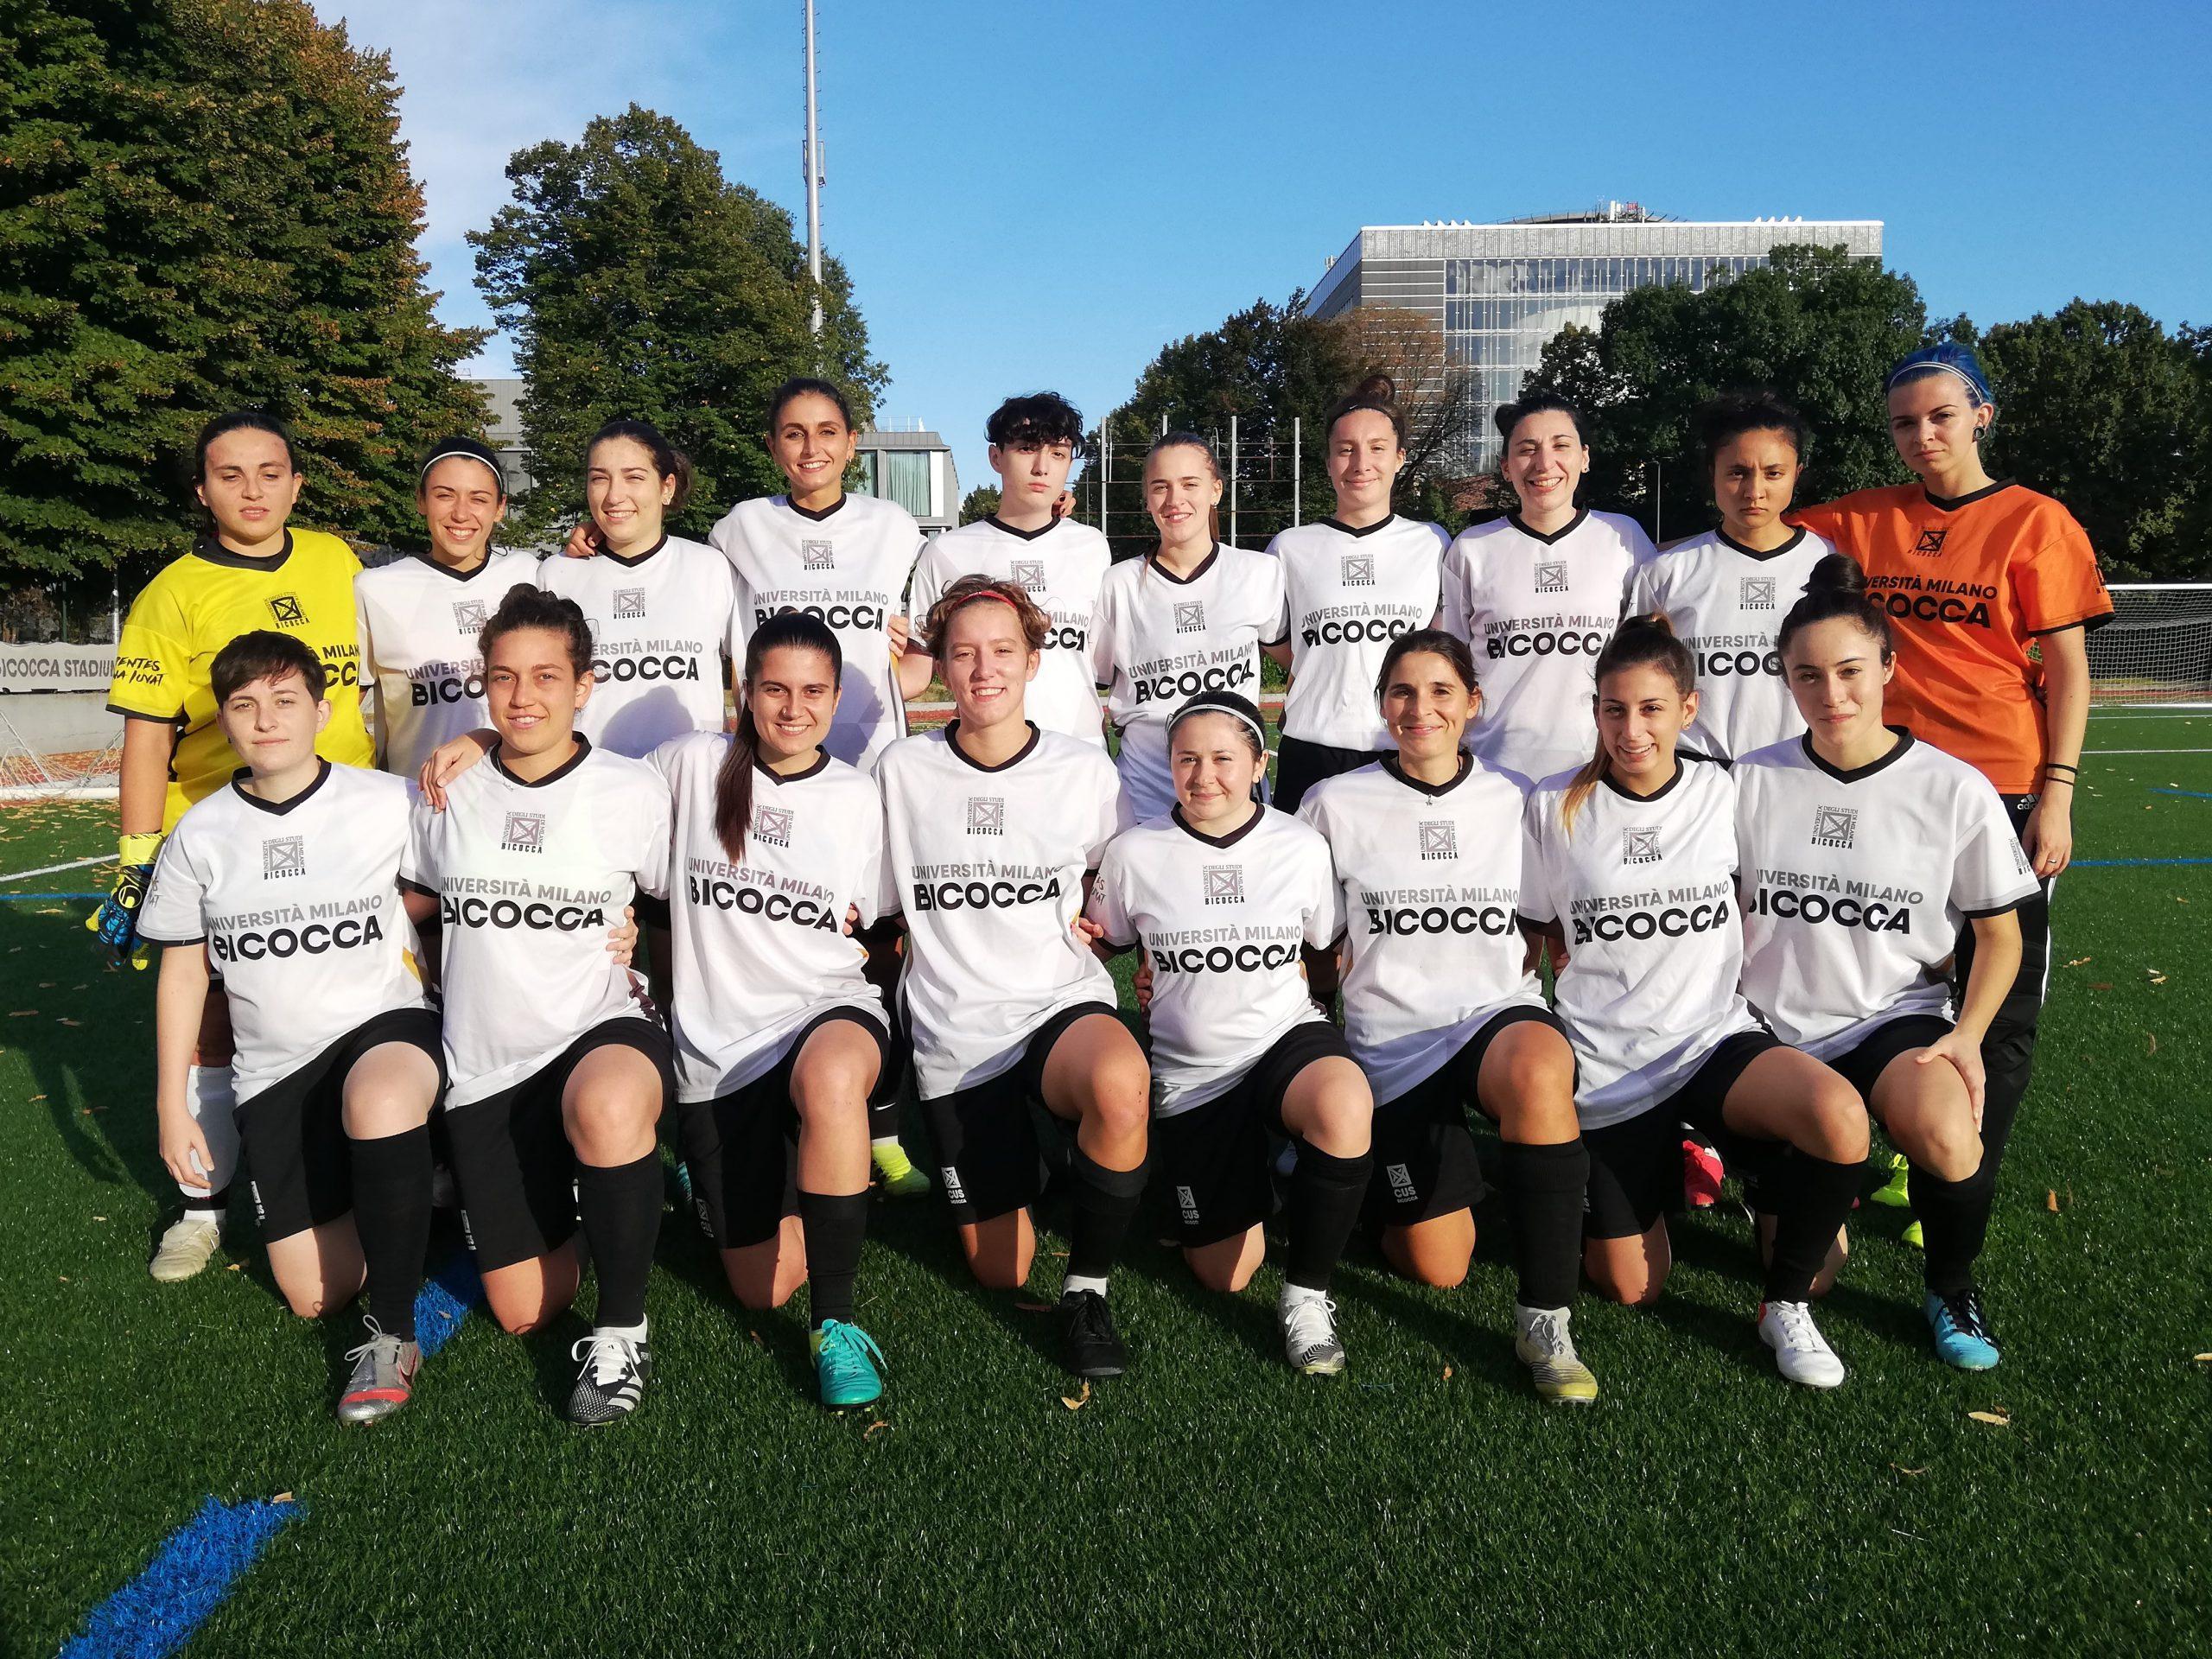 Calcio femminile federale